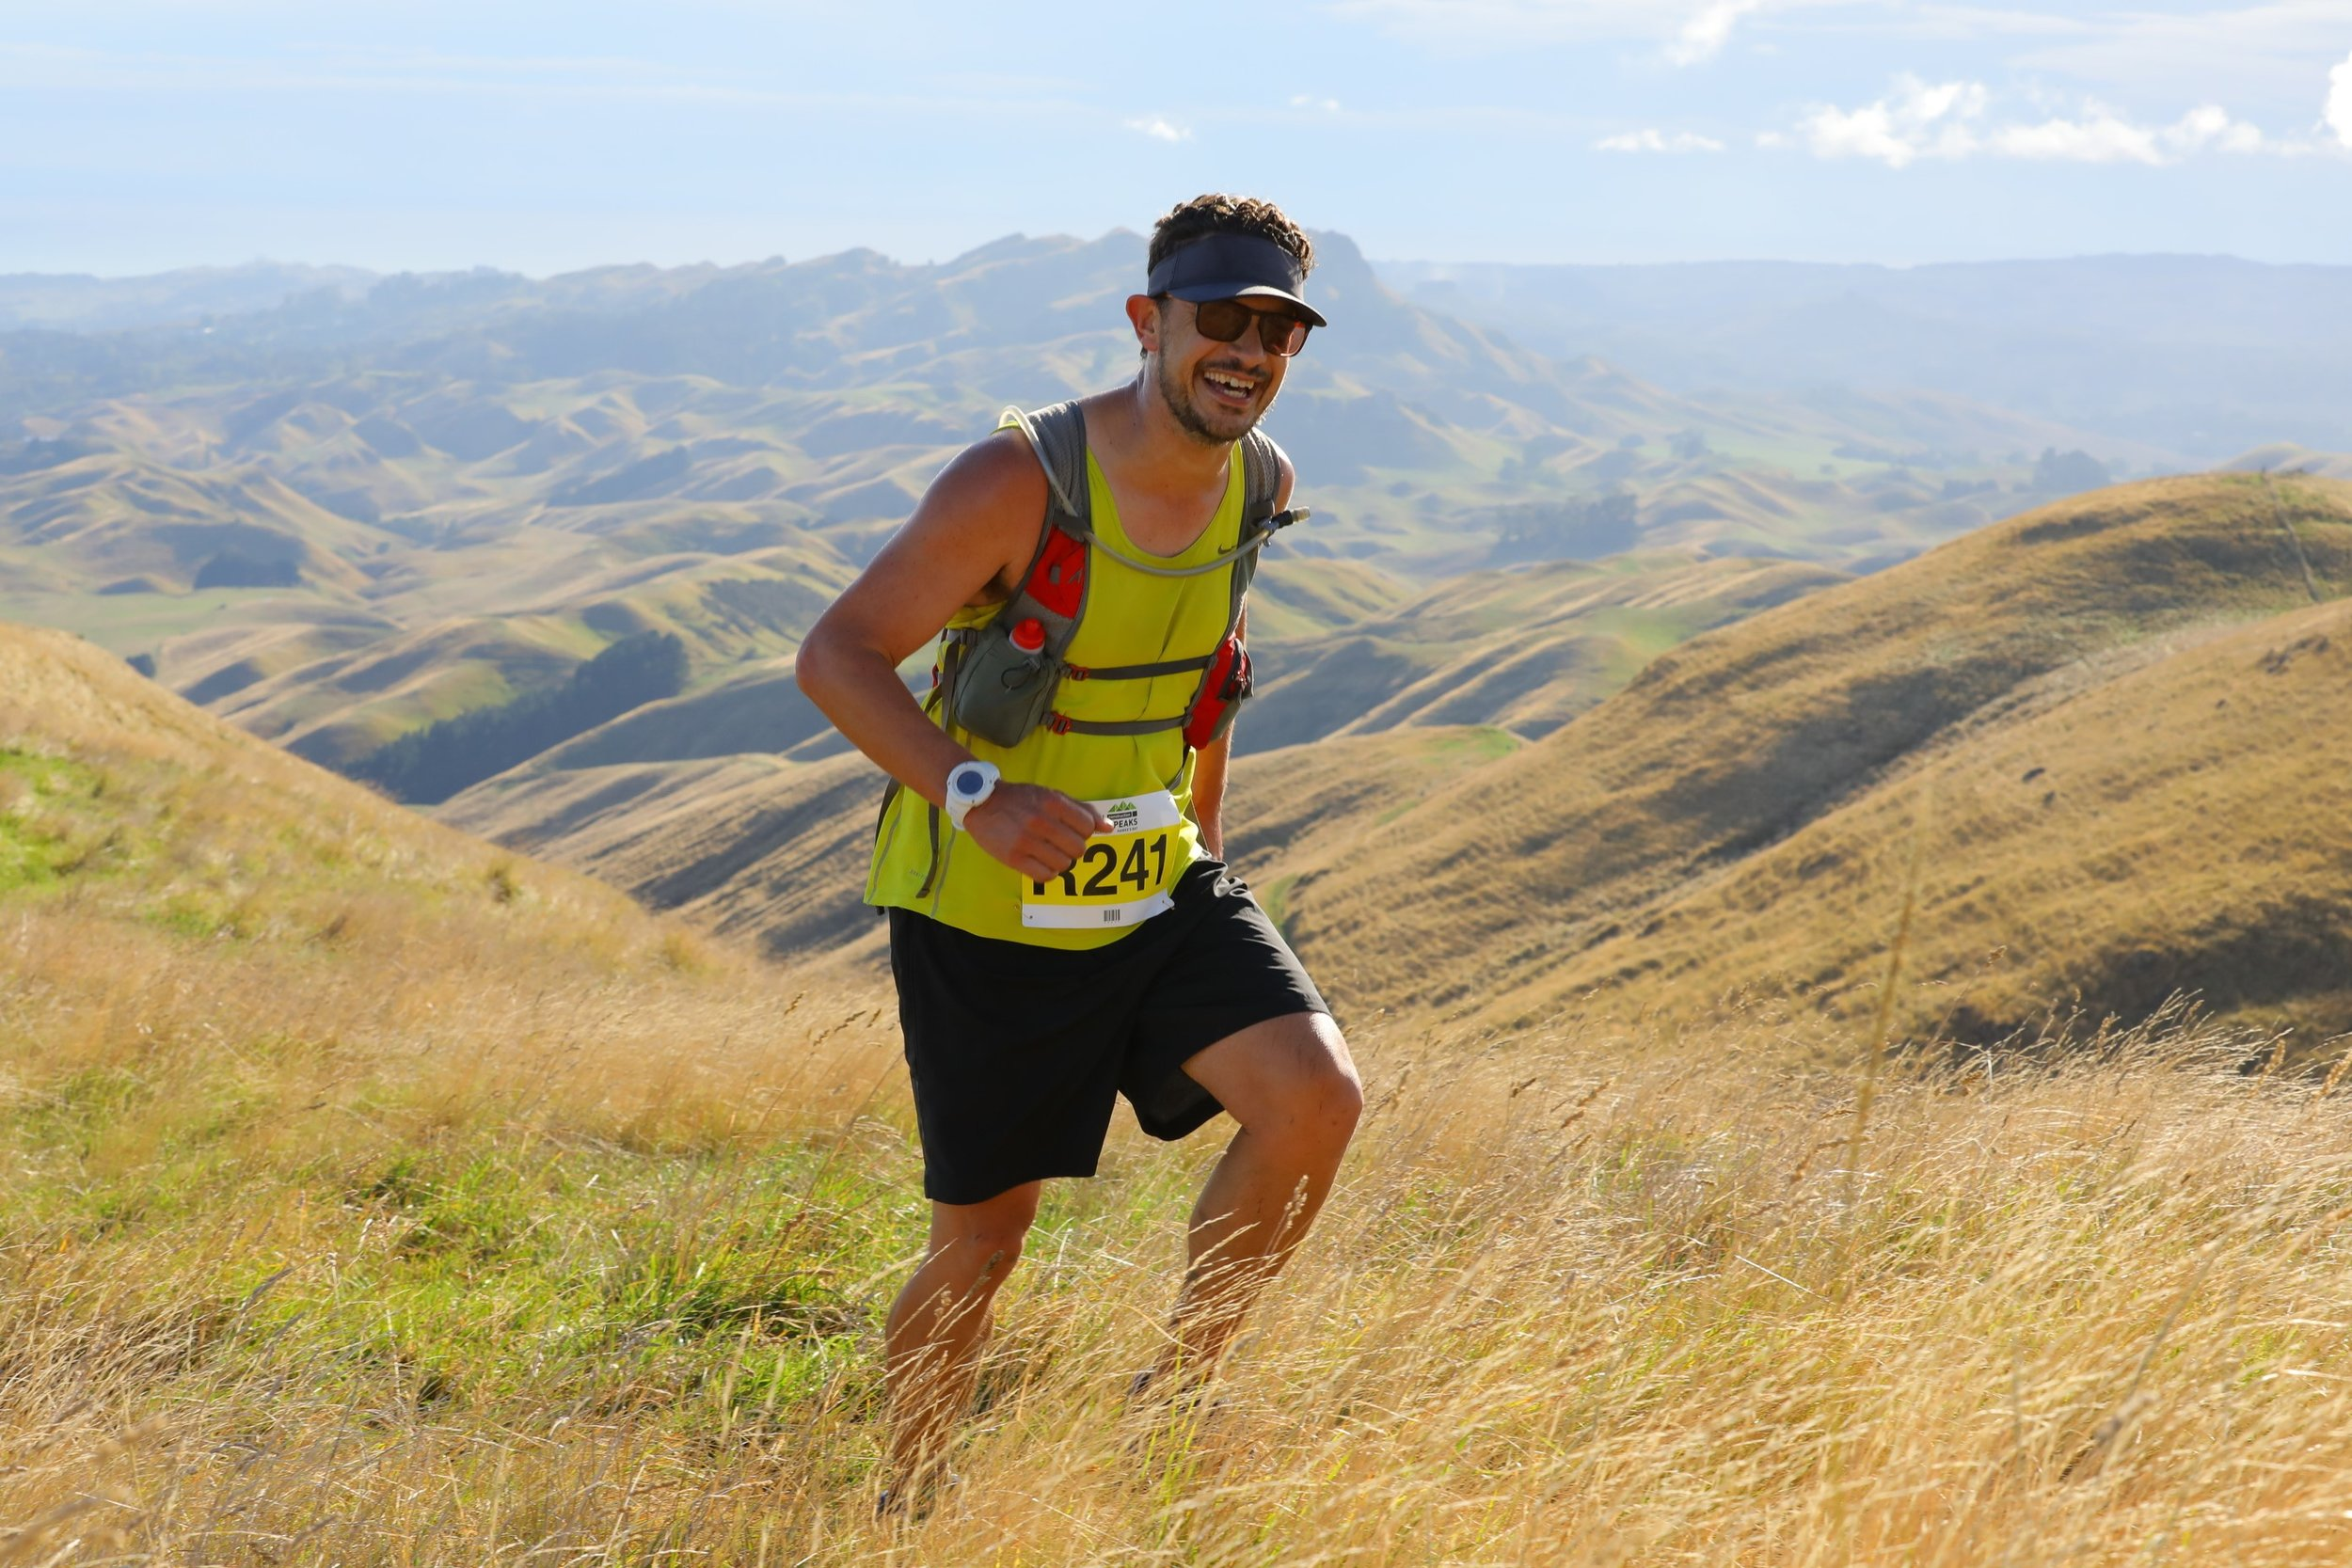 Jonathon Running in the Hills